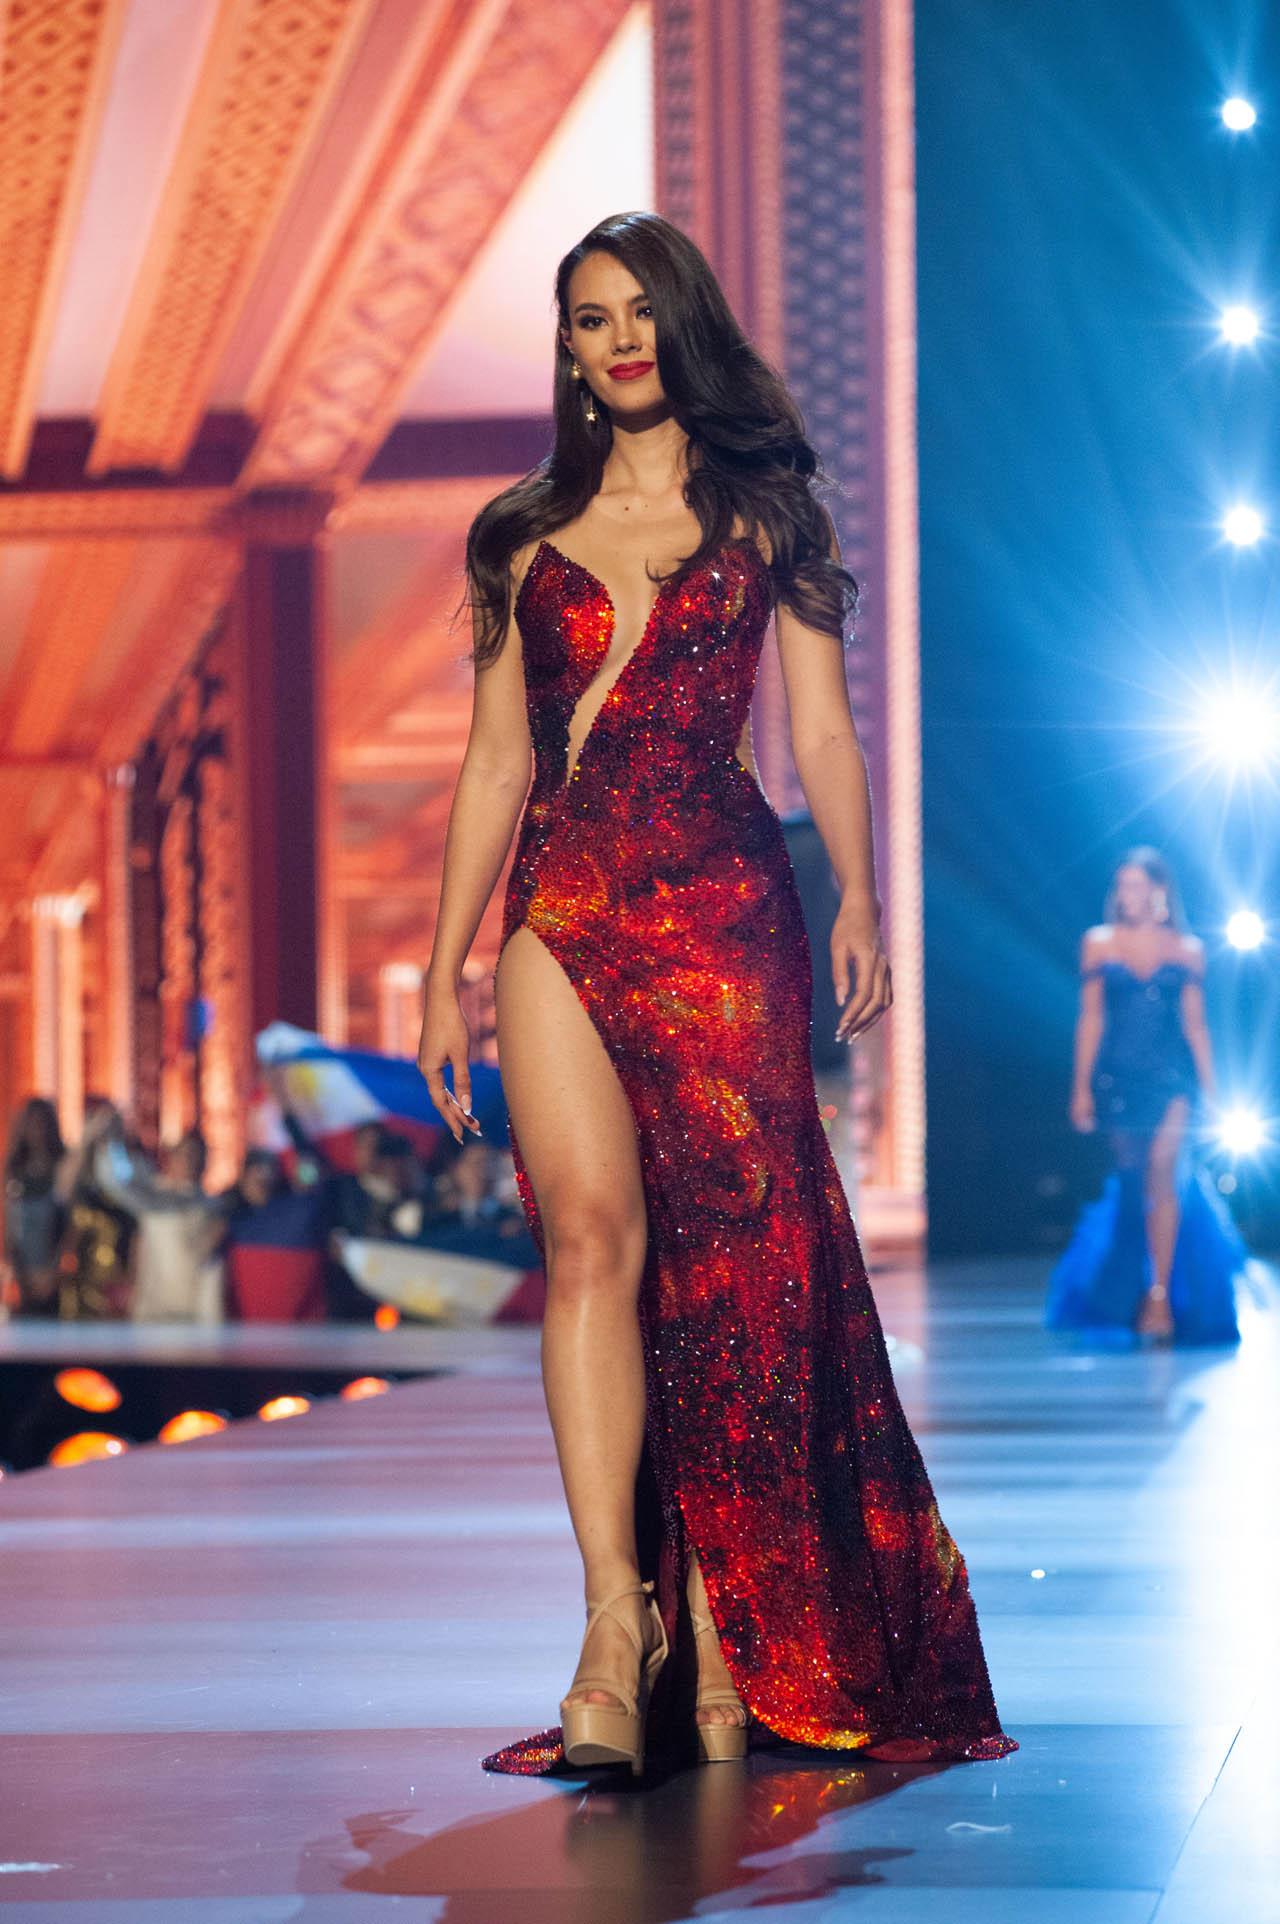 miss eco china 2019 copio look de miss universe 2018 durante final.  6uvbcyqp